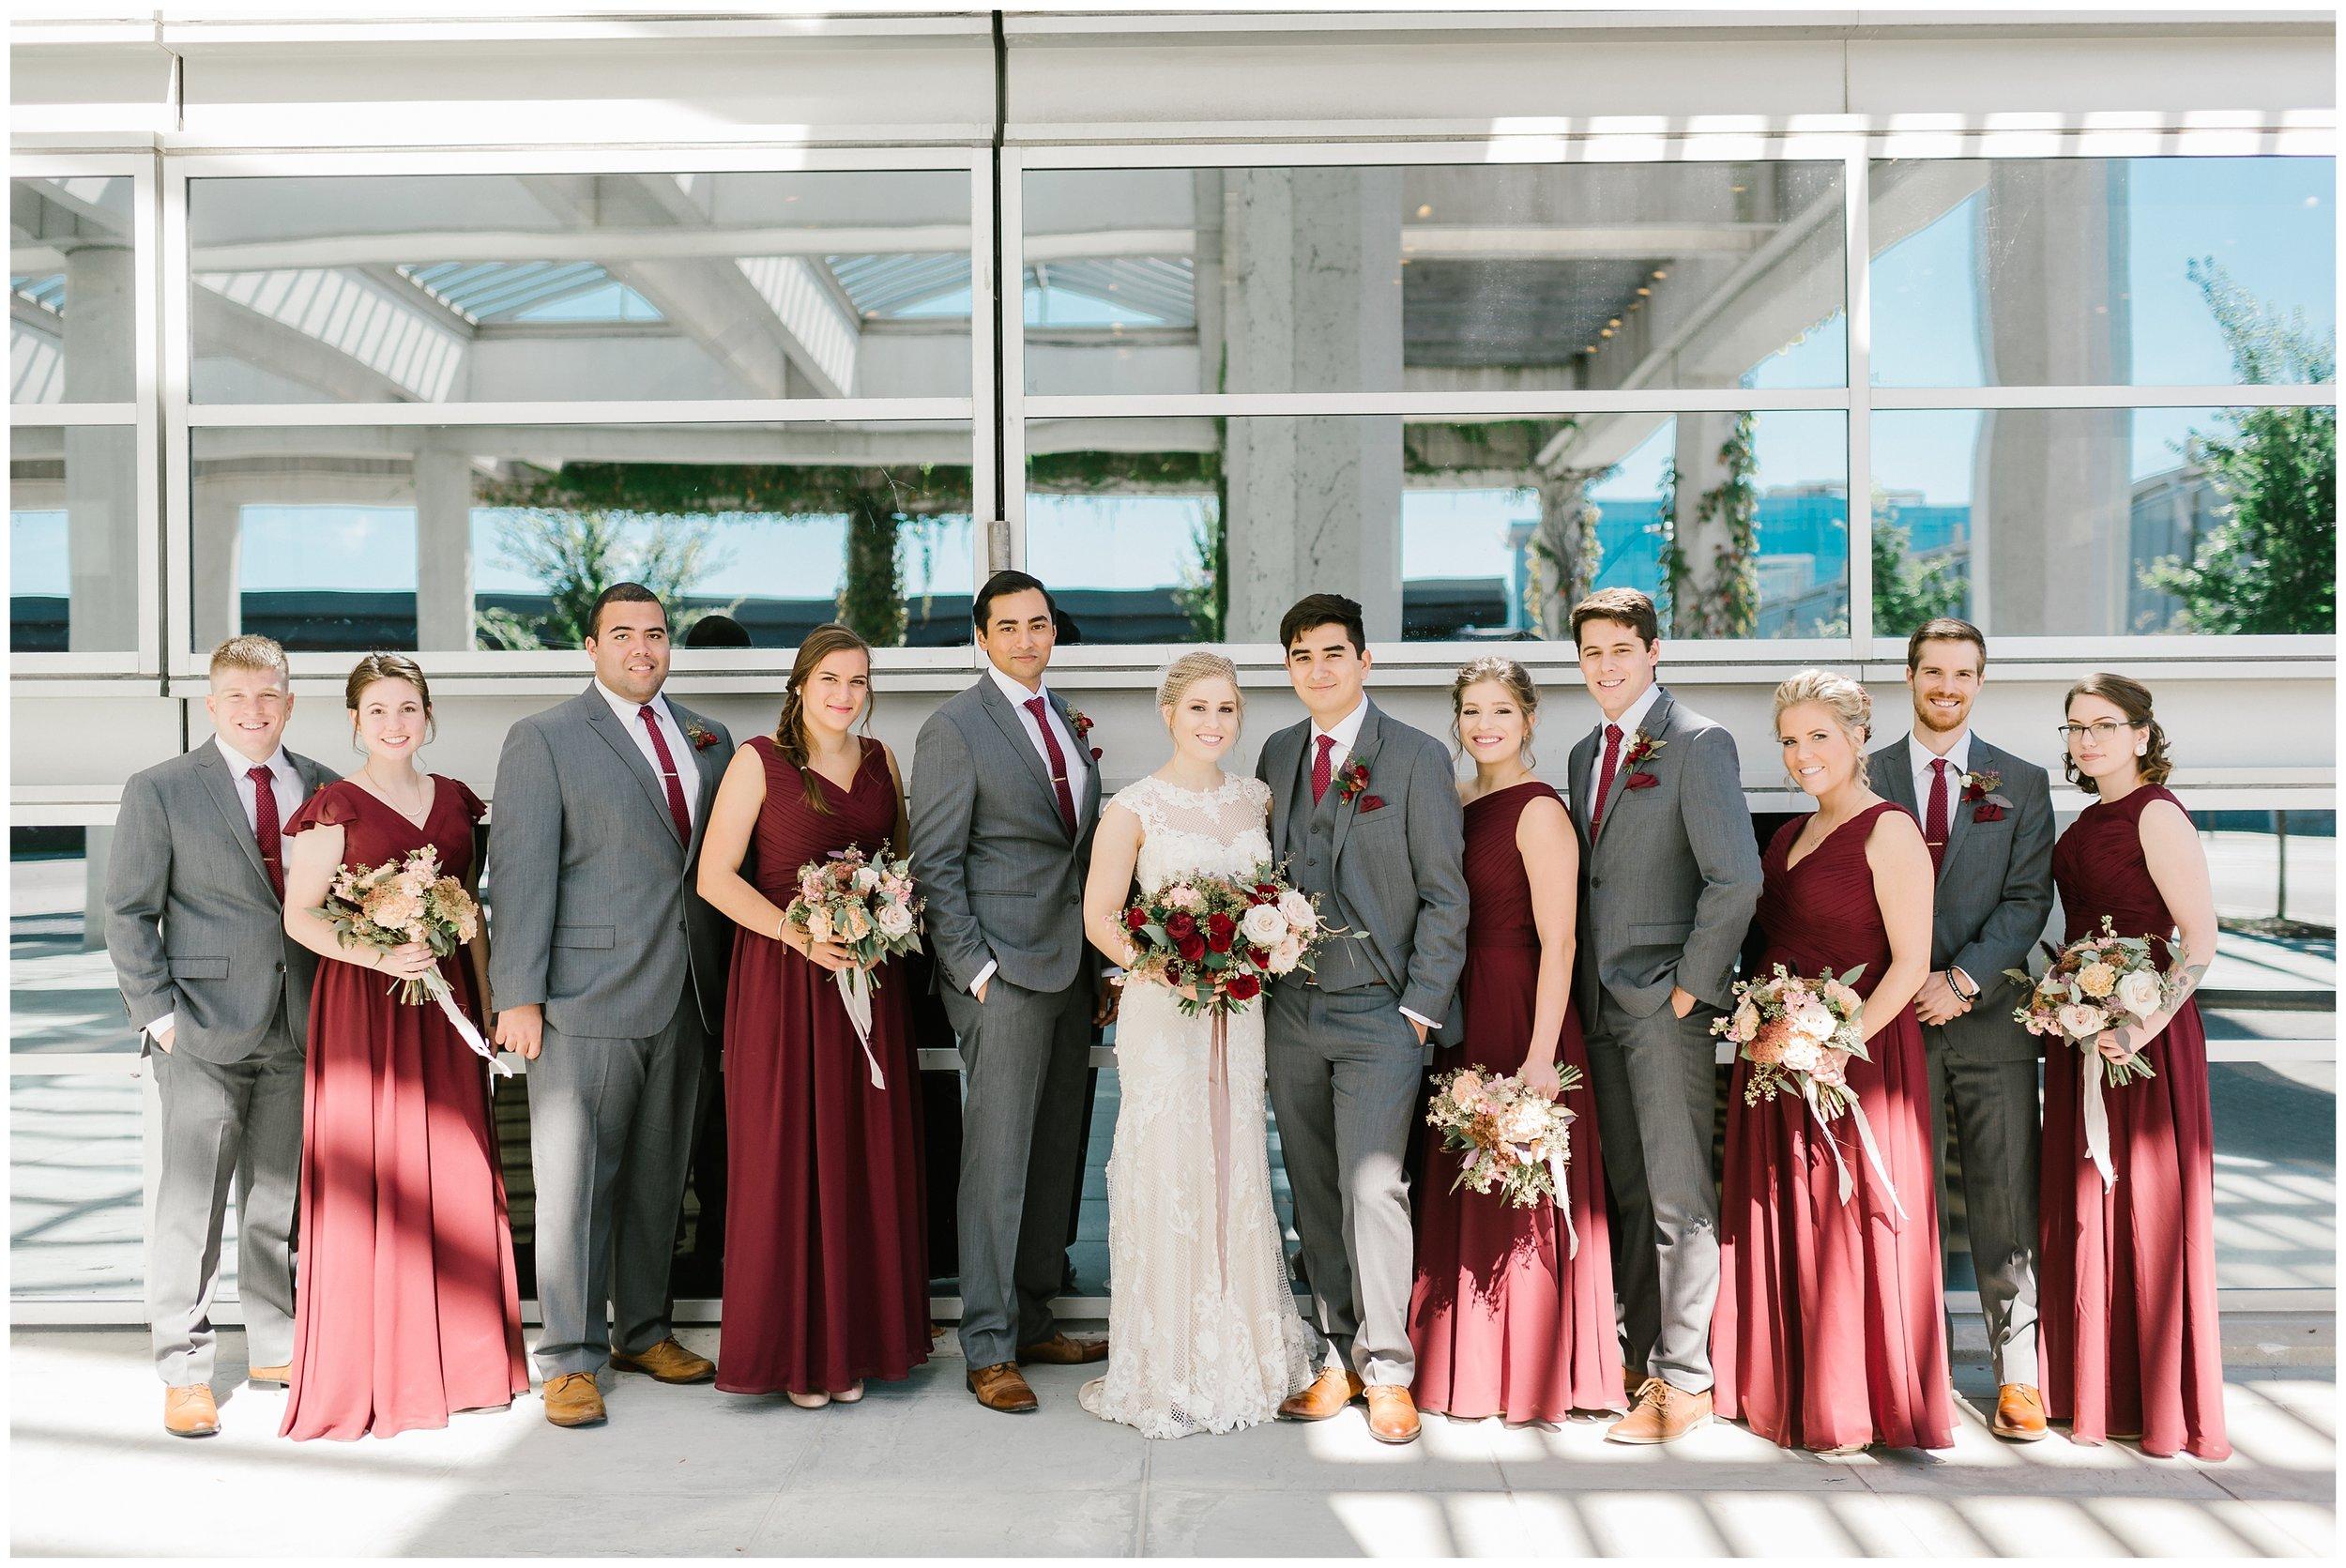 Rebecca_Shehorn_Photography_Indianapolis_Wedding_Photographer_7336.jpg